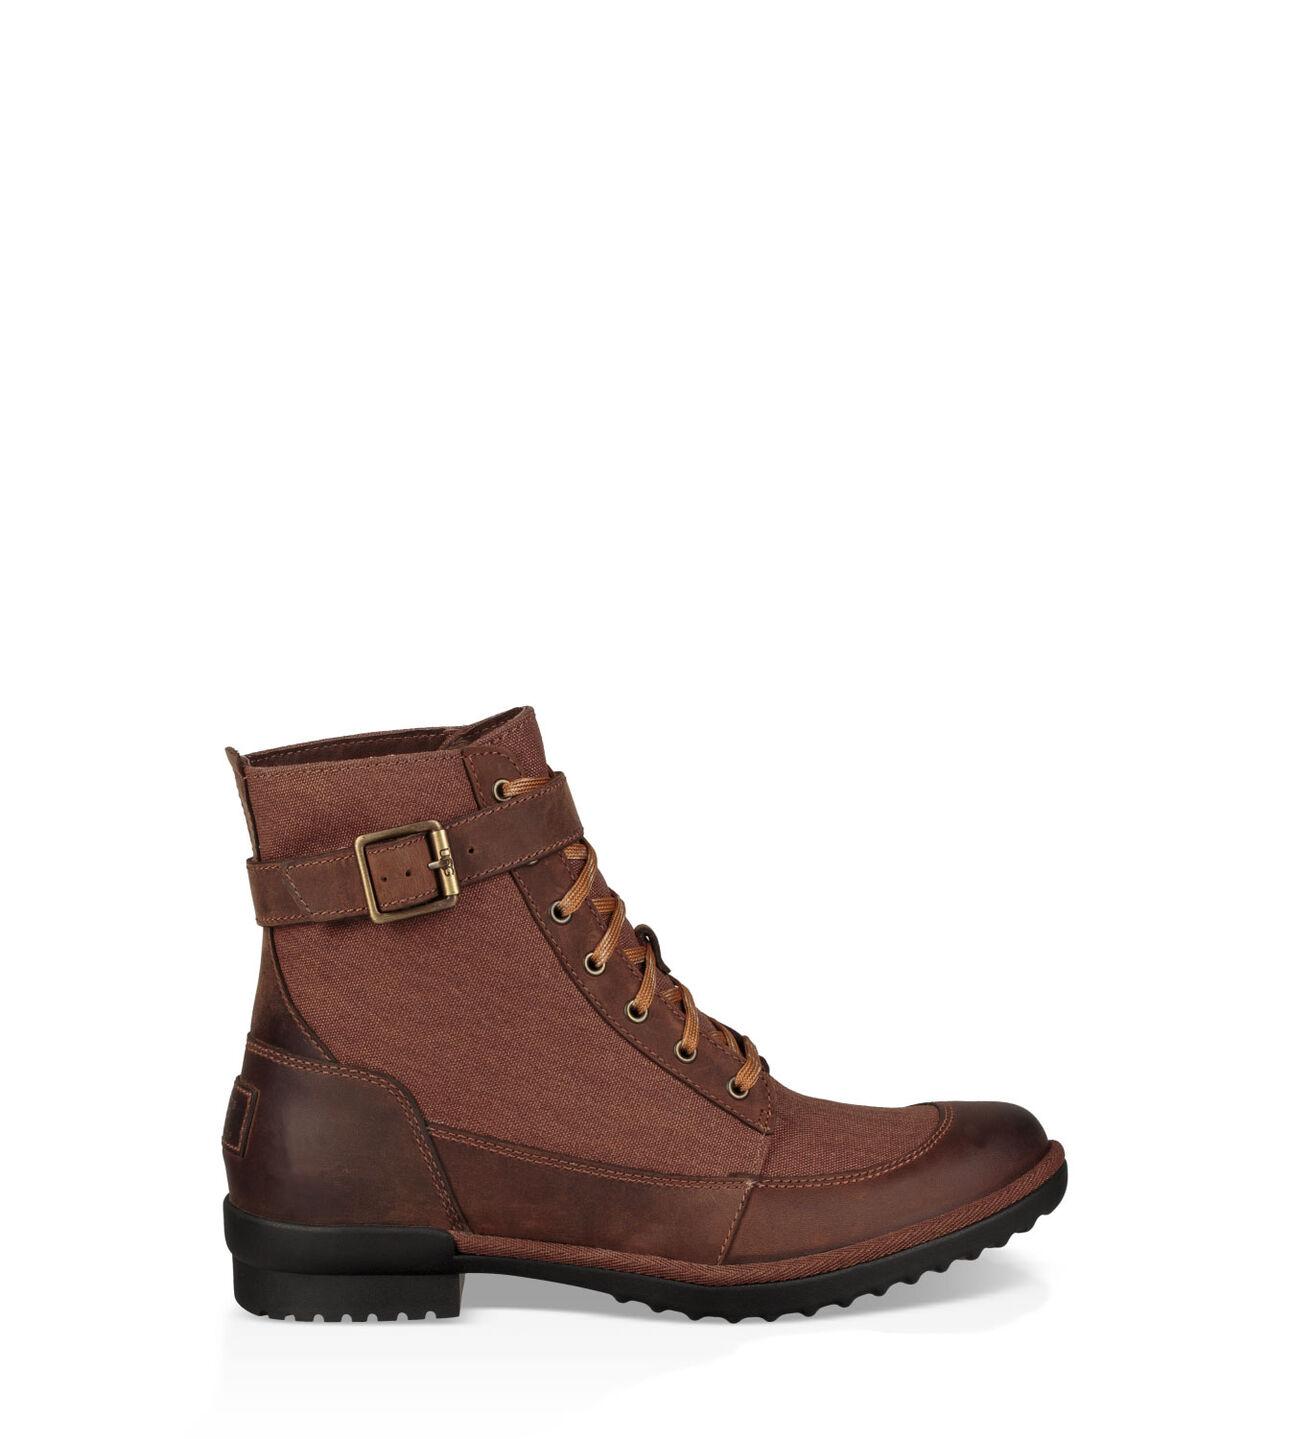 202647ad74b Tulane Boot